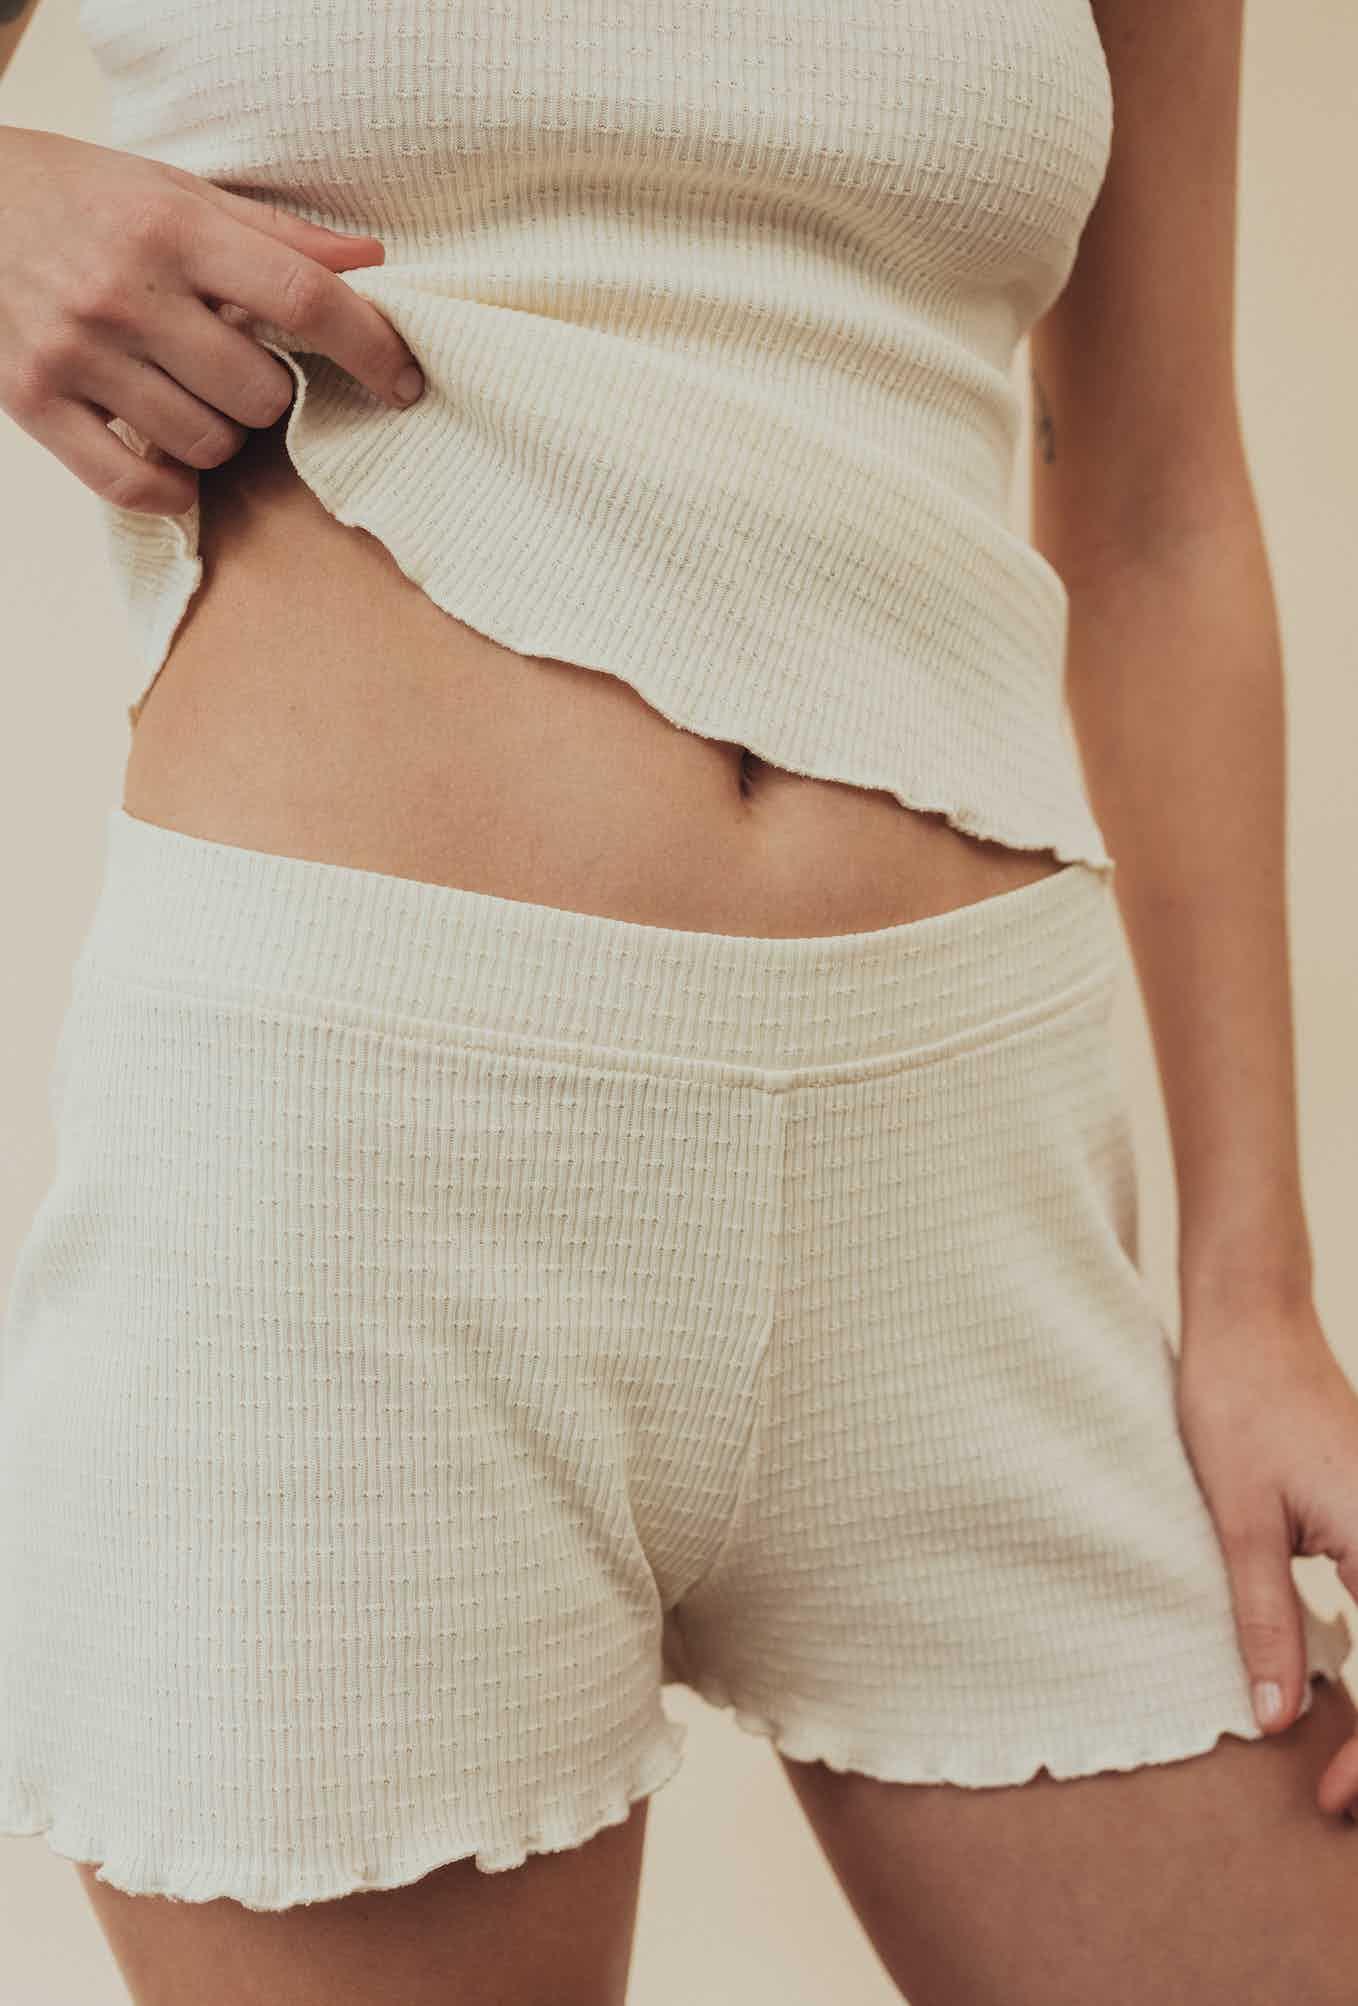 Philippine porte le tee-shirt vanille histoire de corps avec le short vanille histoire de corps